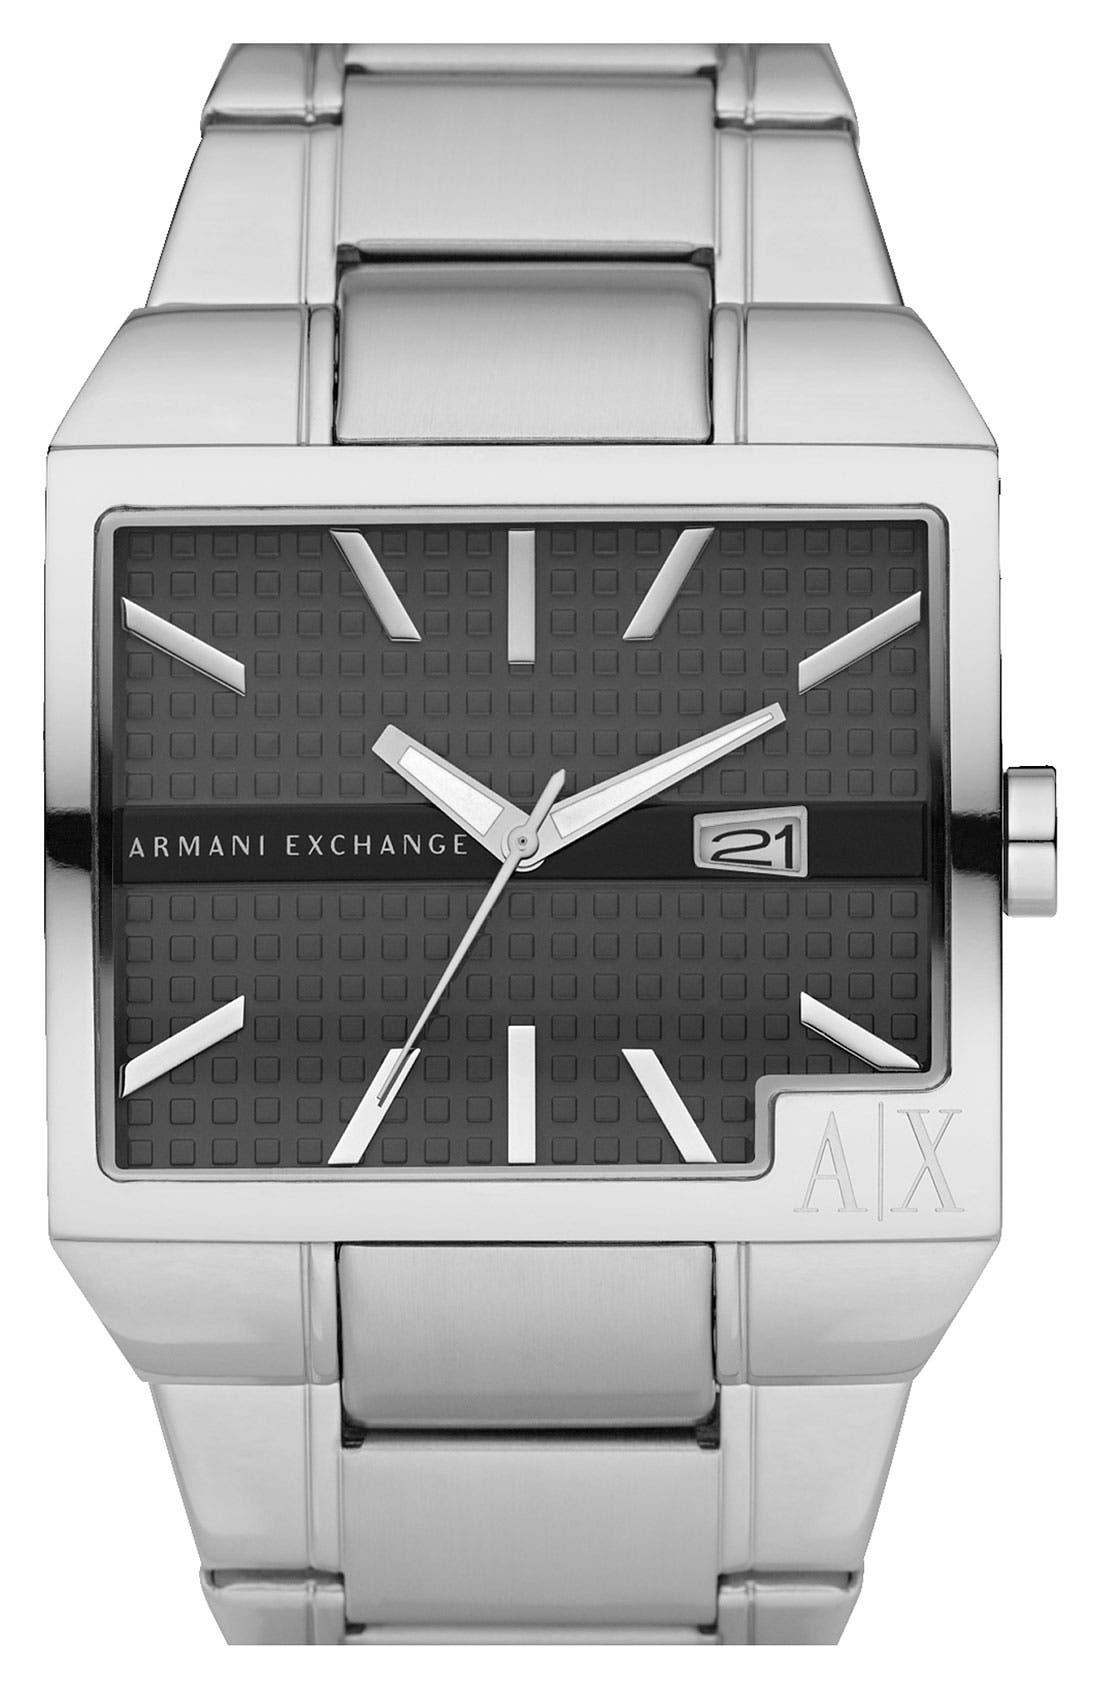 Main Image - AX Armani Exchange Men's Wide Rectangular Watch, 43mm x 36mm